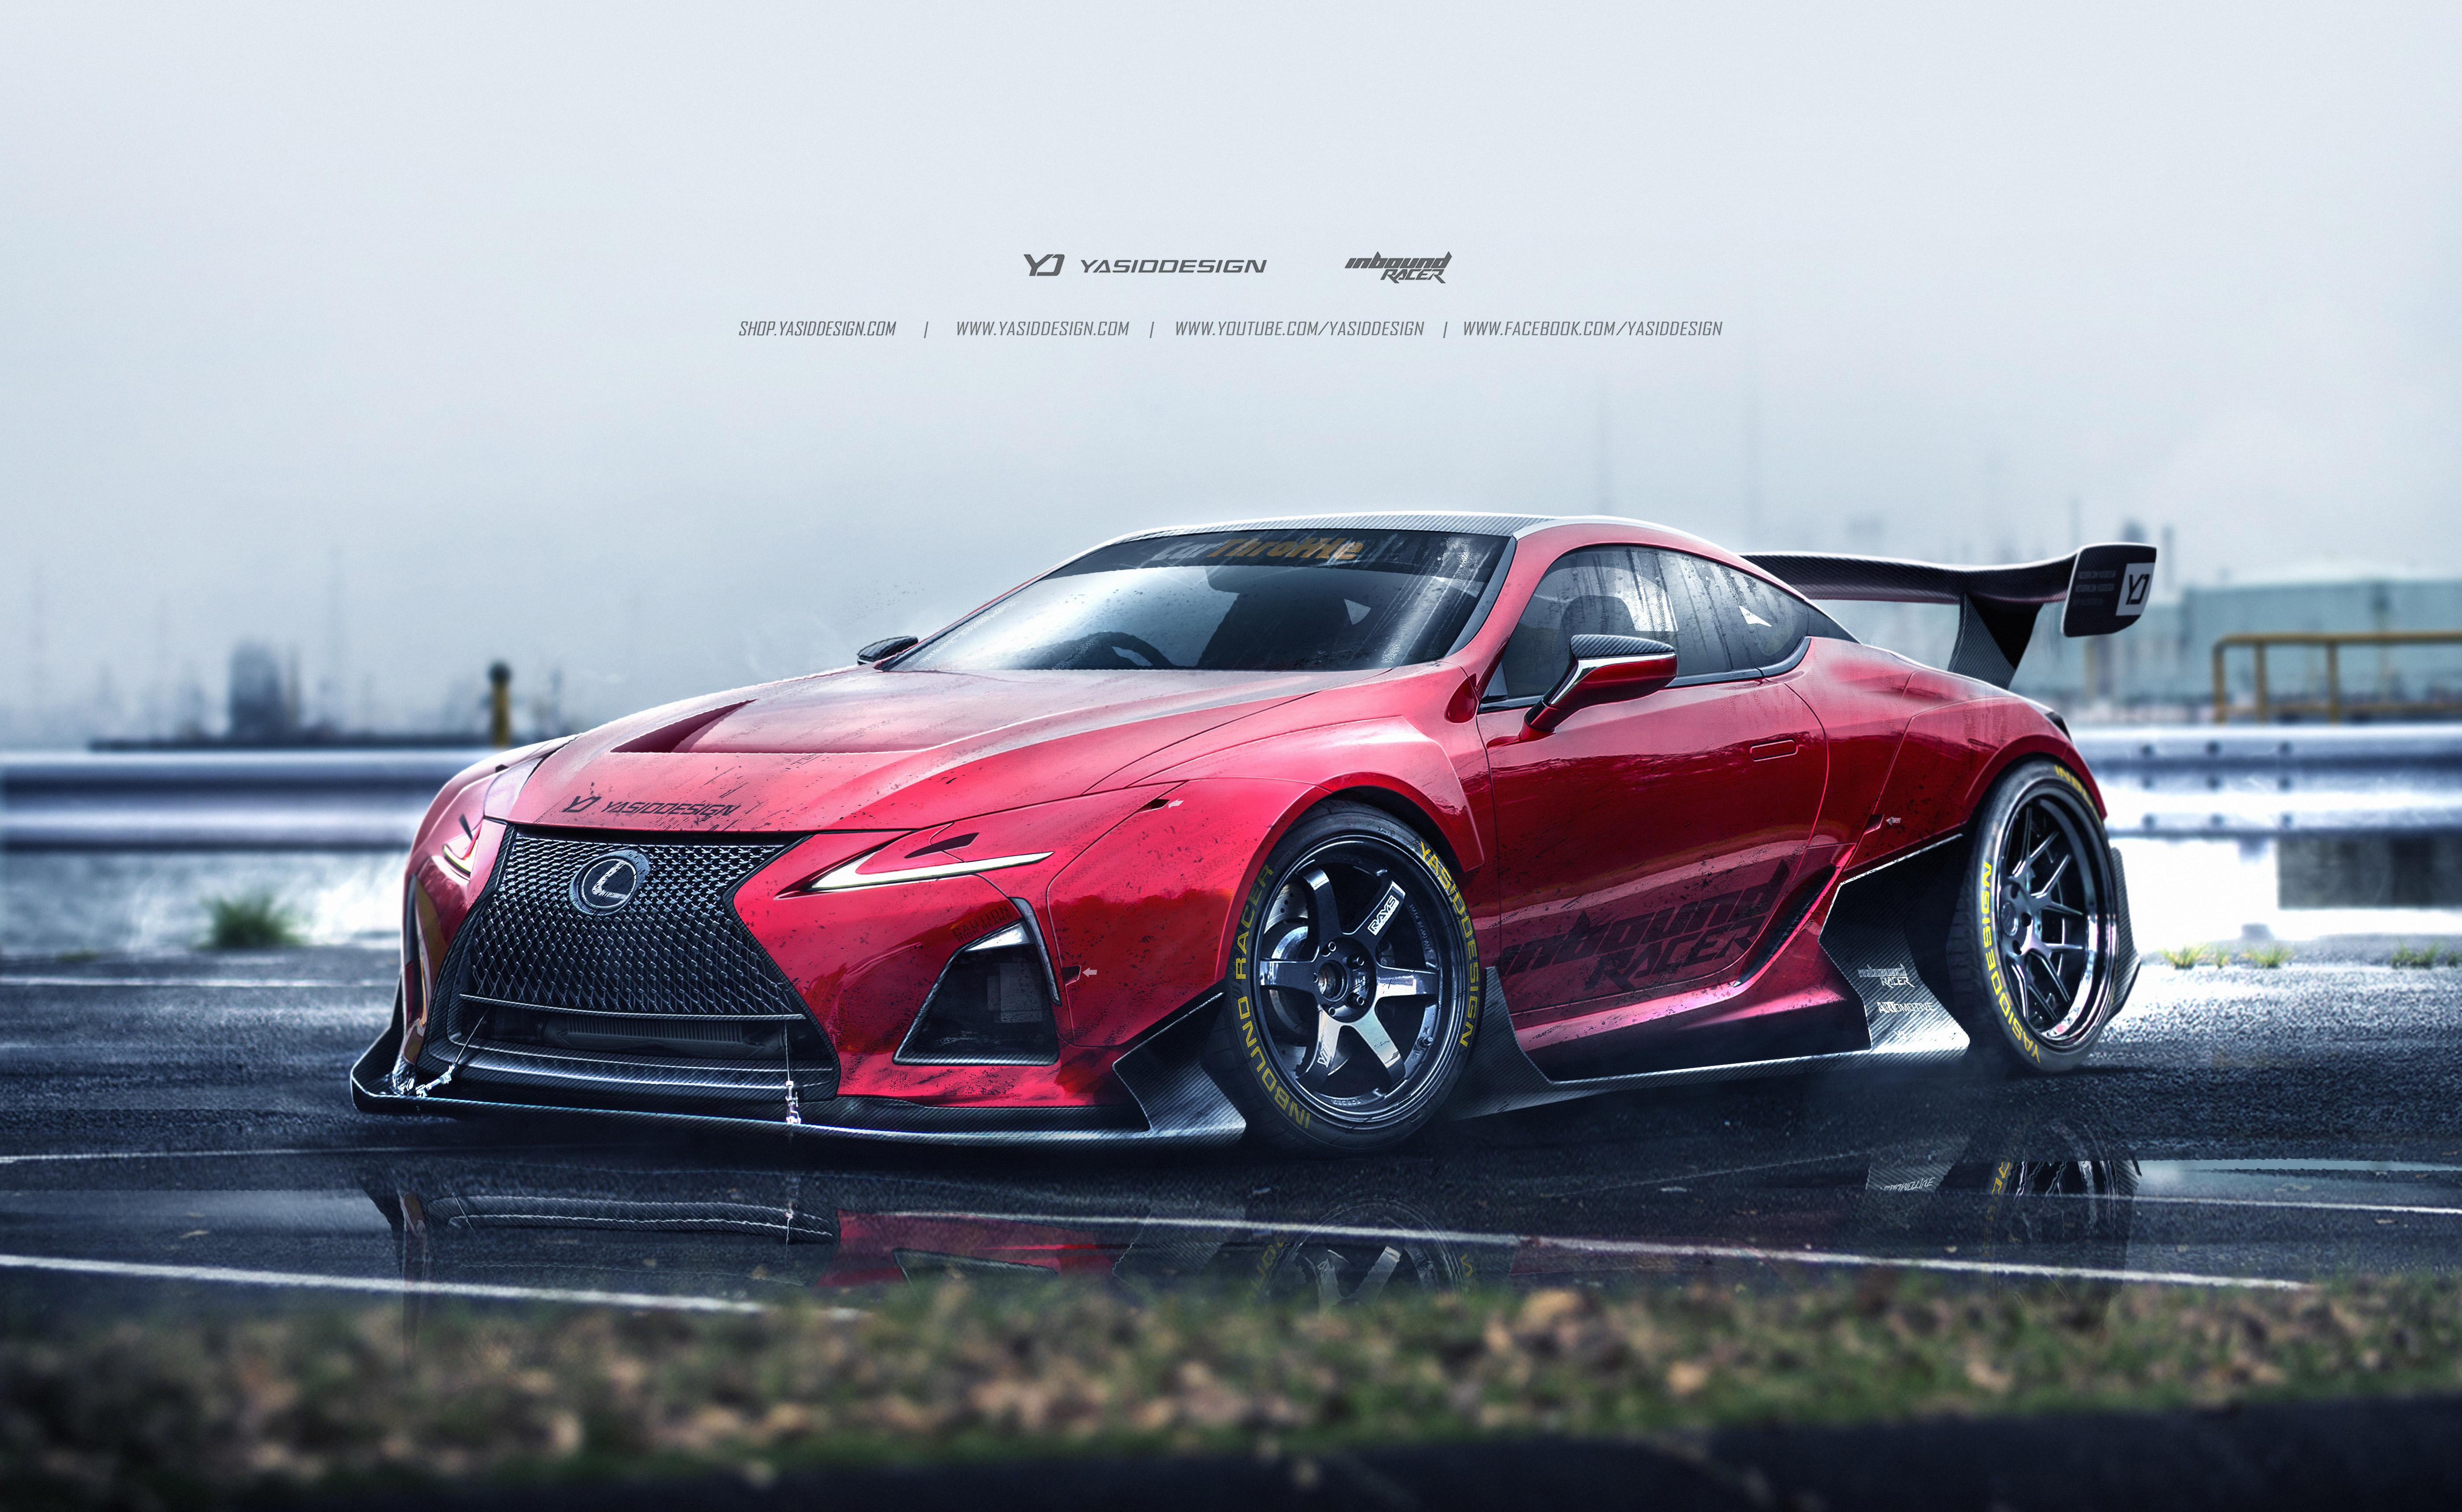 Lexus Lc500 Fan Design Hd Cars 4k Wallpapers Images Backgrounds